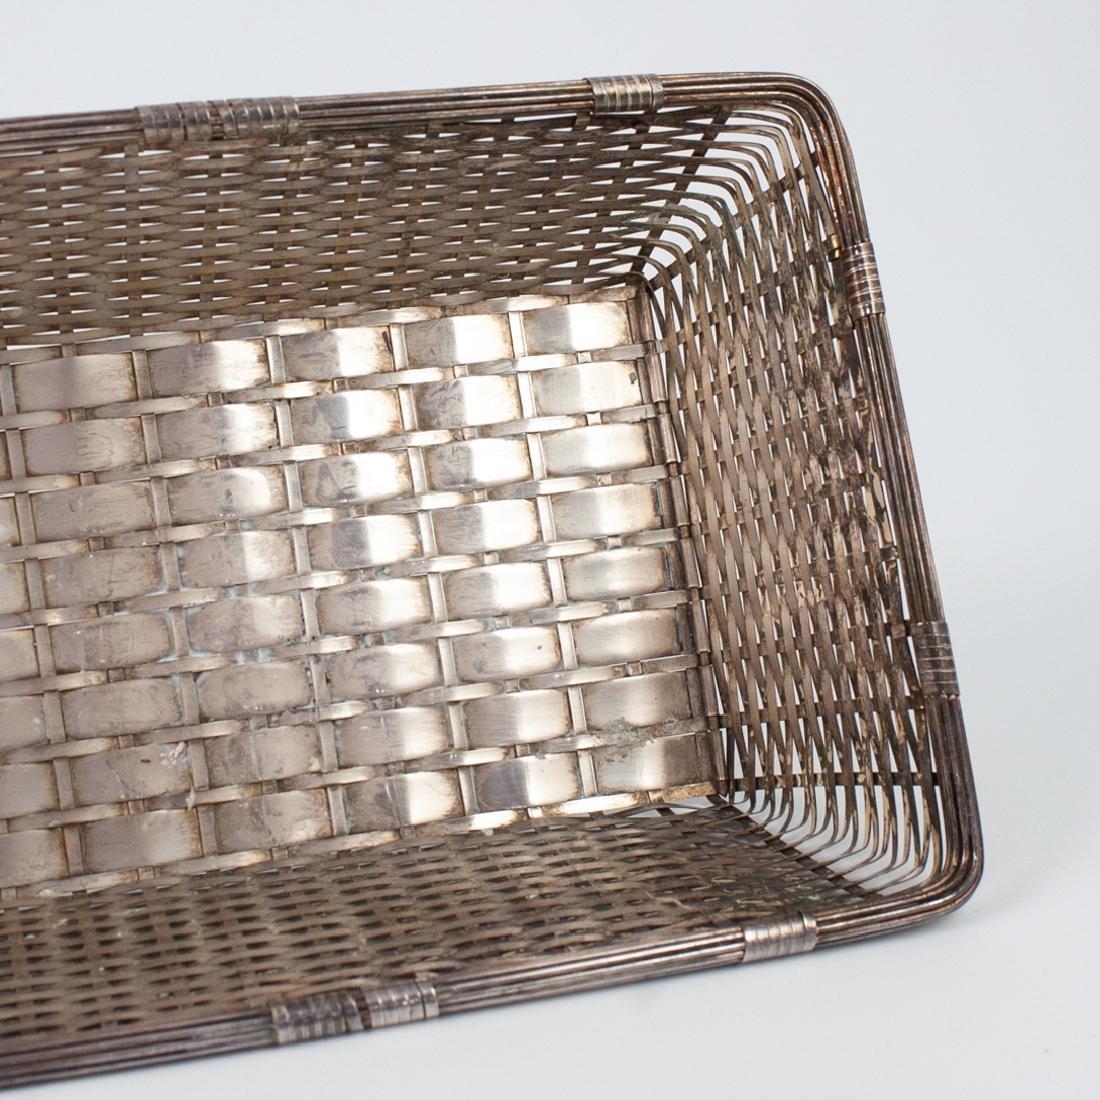 Christofle Silver-Plated Basket - 3